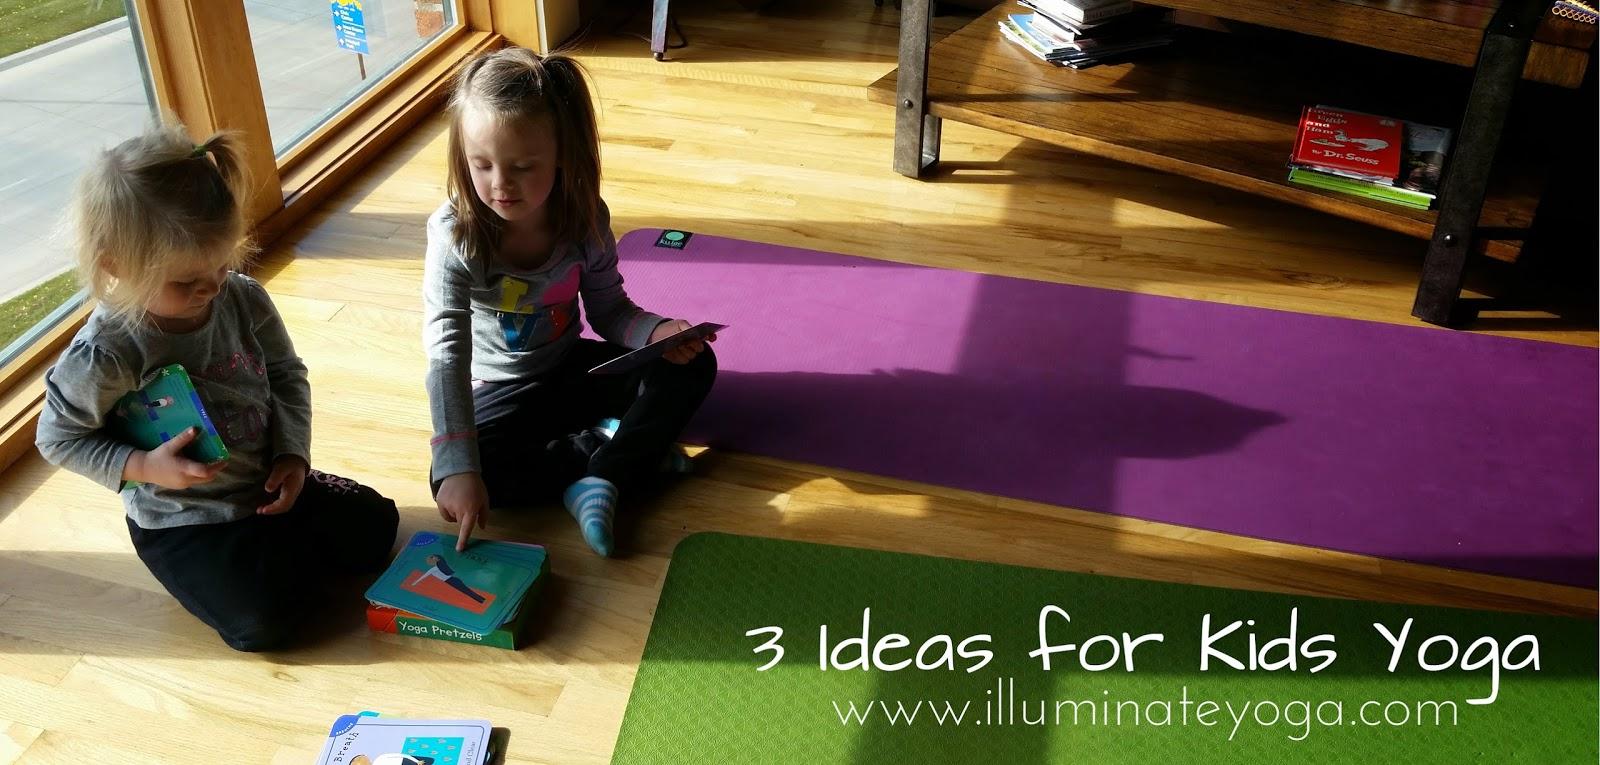 Letu0027s Play Yoga: 3 Ideas For Kids Yoga